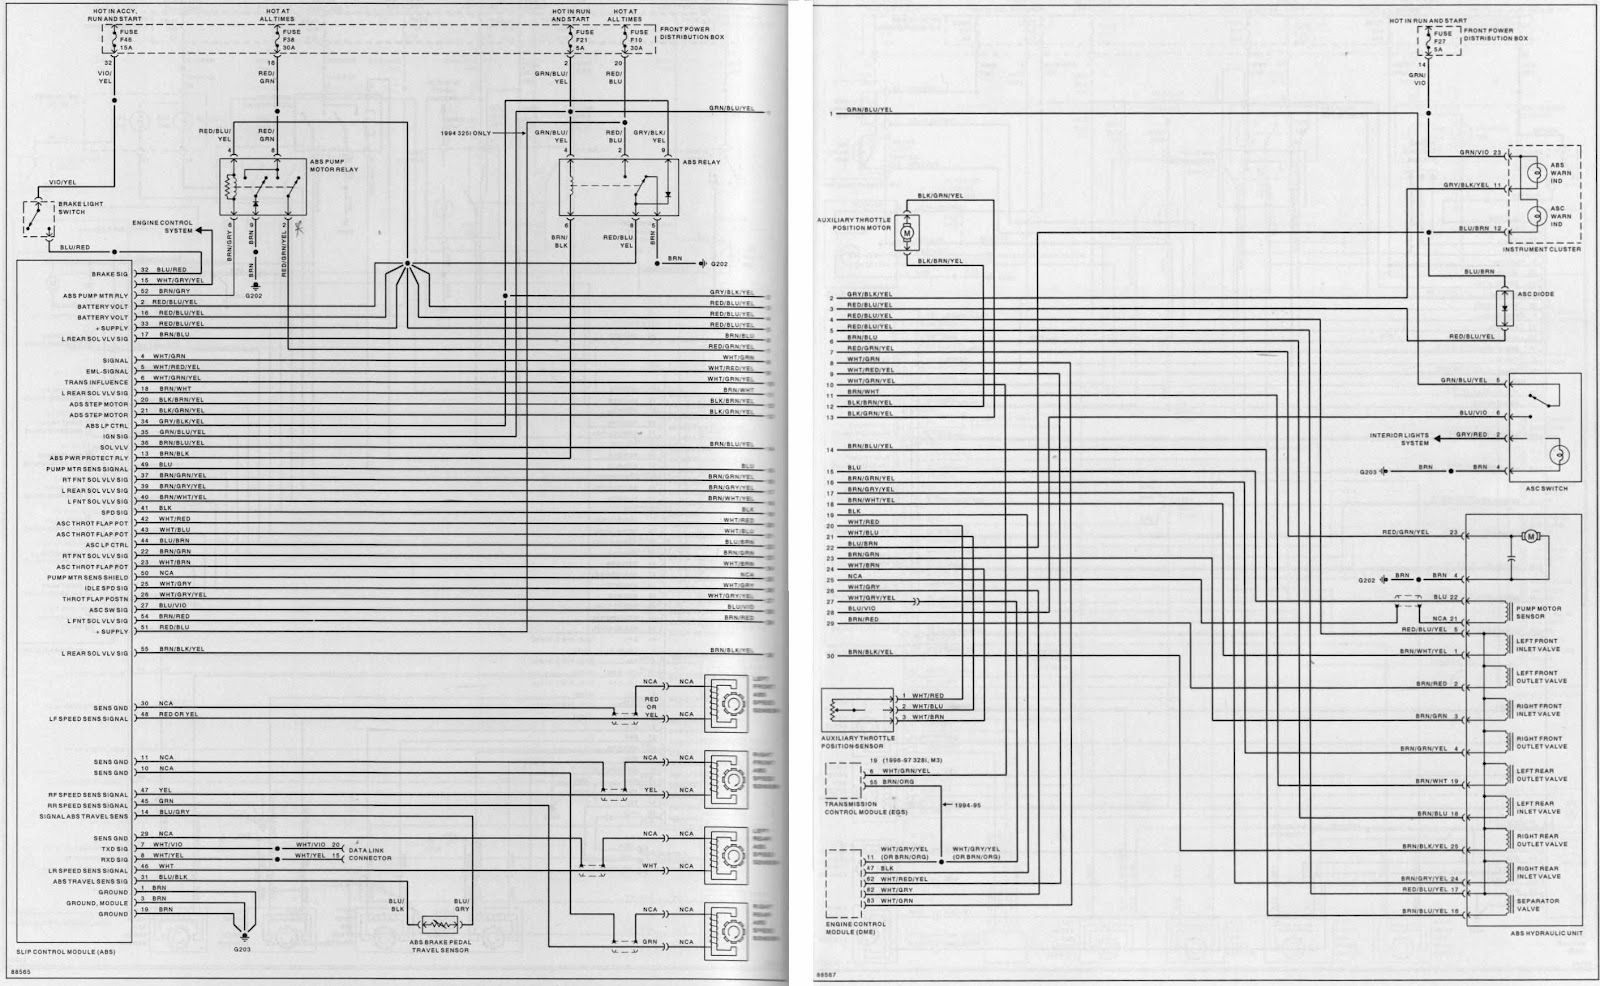 325e Bmw Wiring Harness Diagram - wiring data